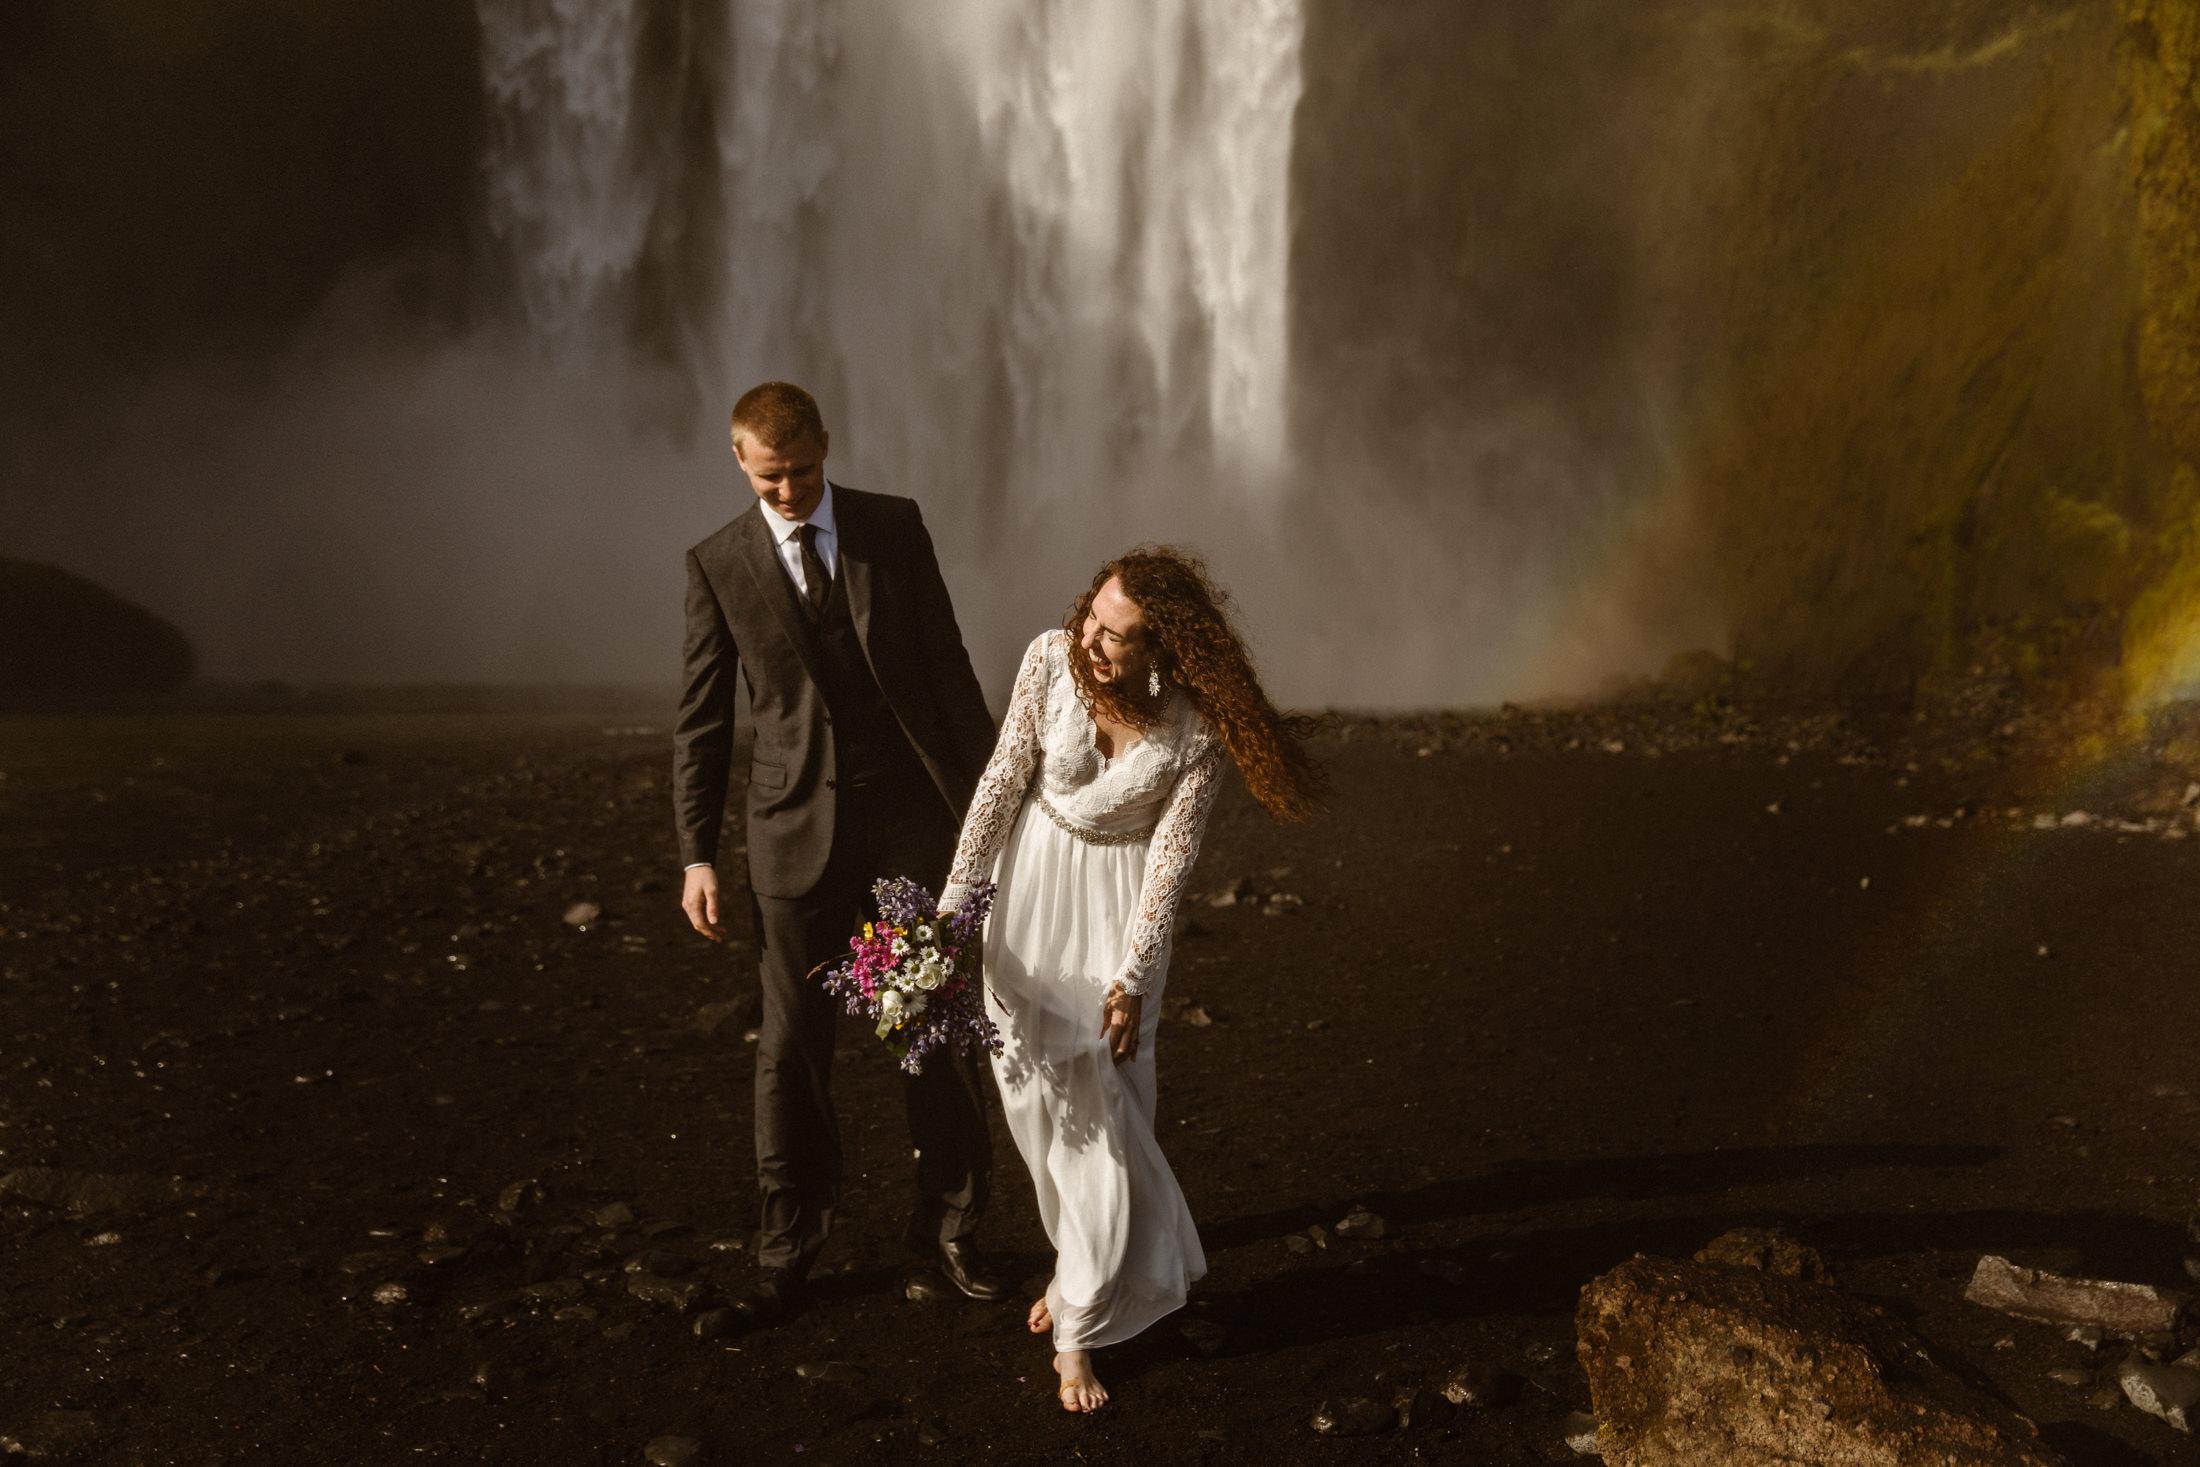 elope-at-skogafoss-waterfall-in-iceland-narrowleaf-photography-5032.JPG